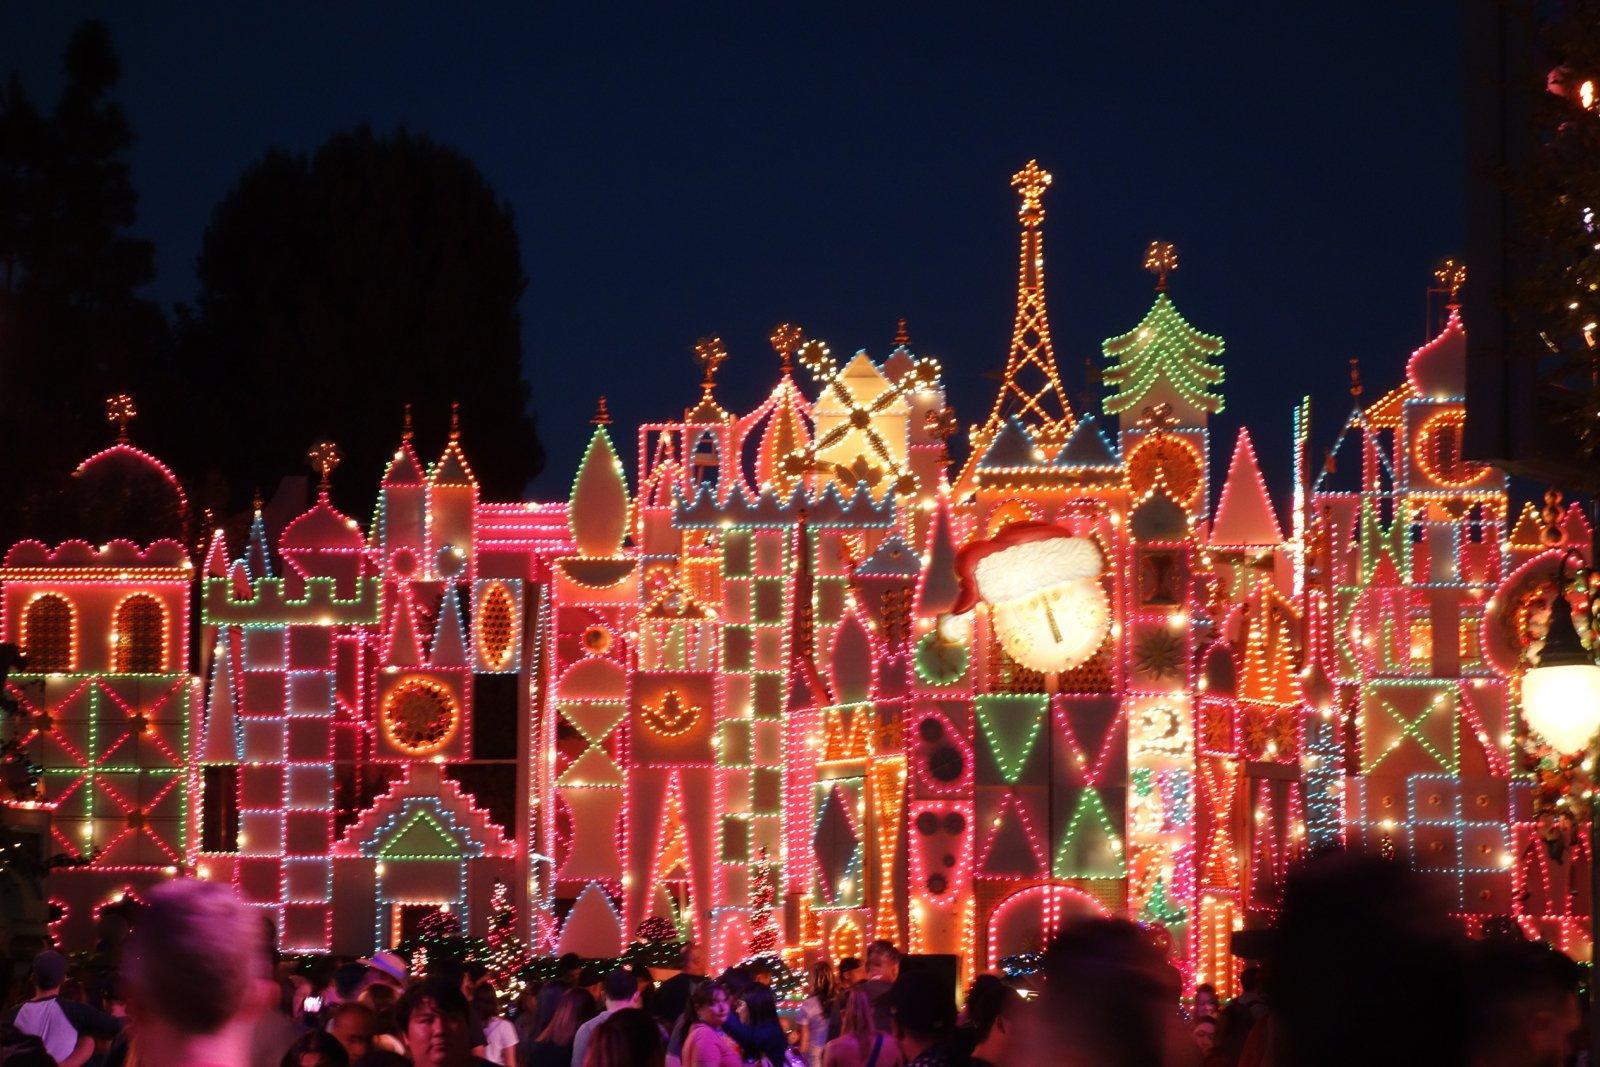 5 Reasons You Will Love the Holidays at Disneyland